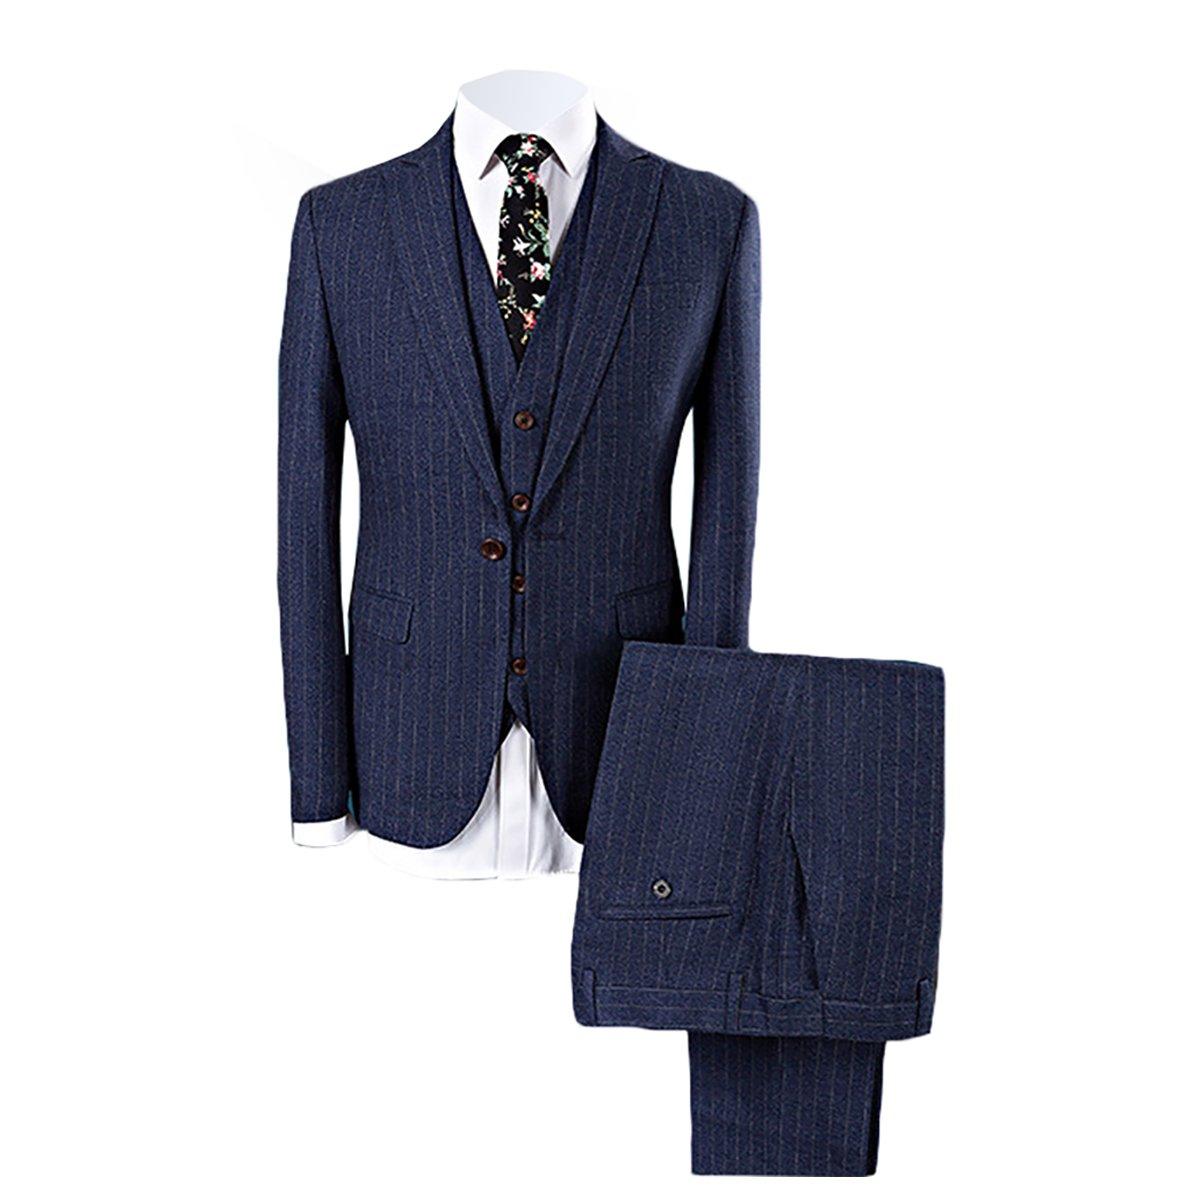 WEEN CHARM メンズ スーツスリーピース ブルー ネイビー B076J8D2F4 M|ネイビー ネイビー M